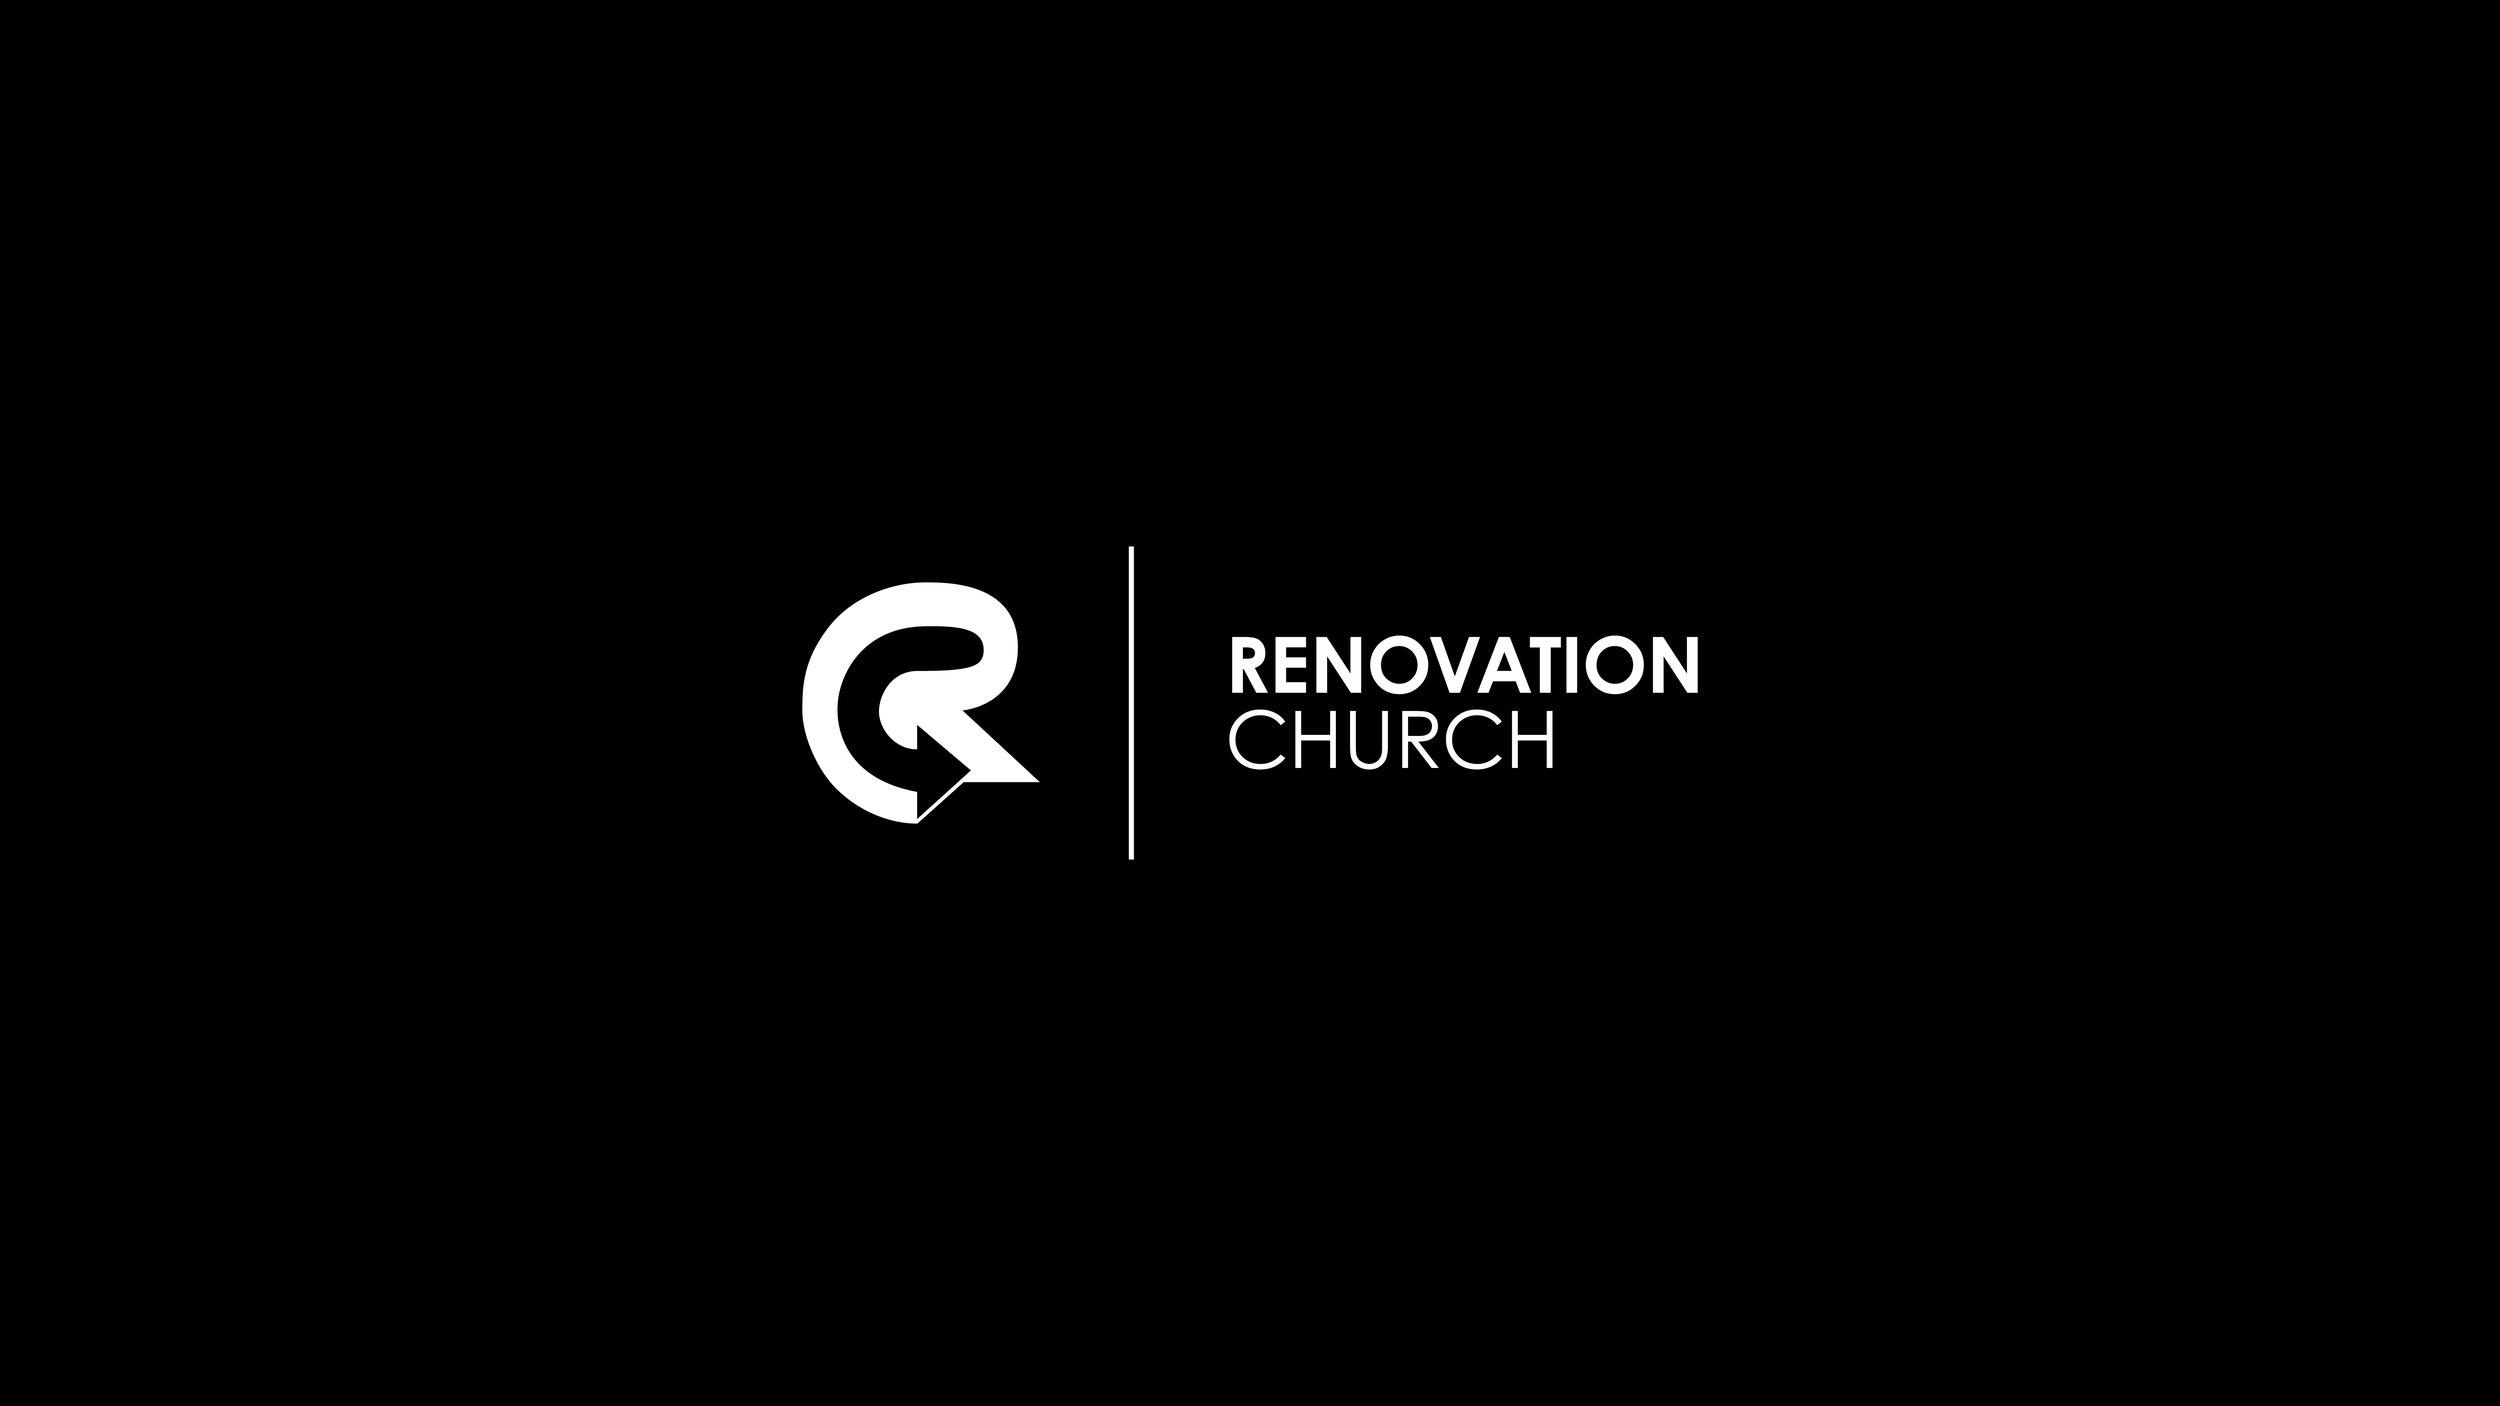 Renovation Church plain black slide.jpg